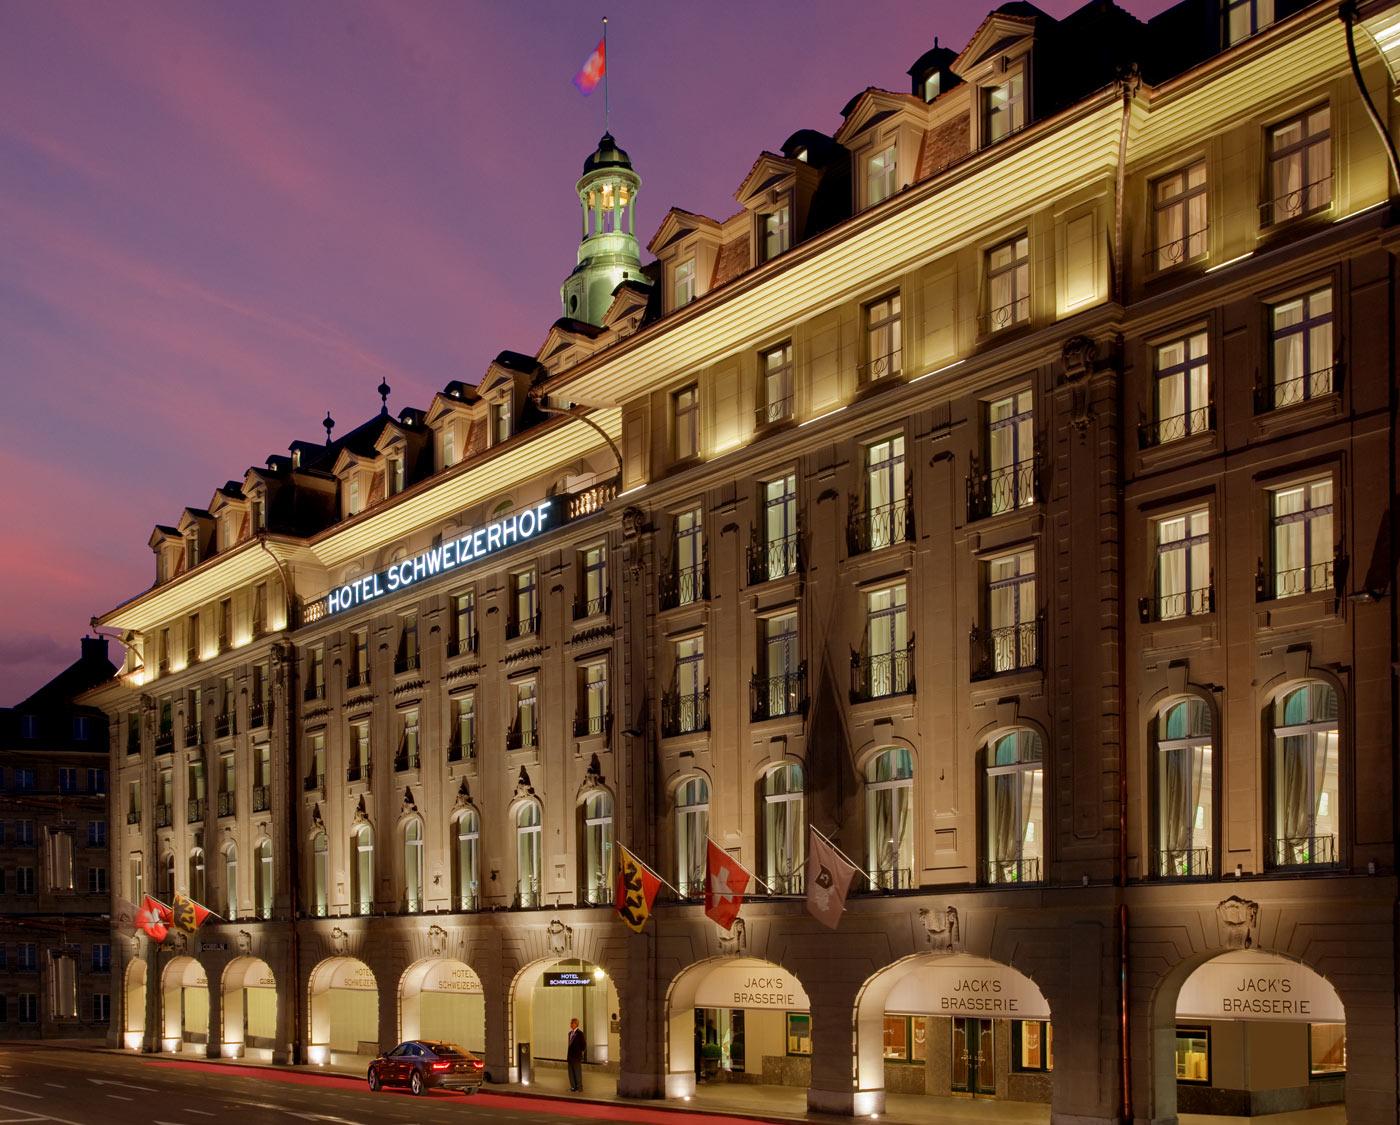 Stay hotel schweizerhof